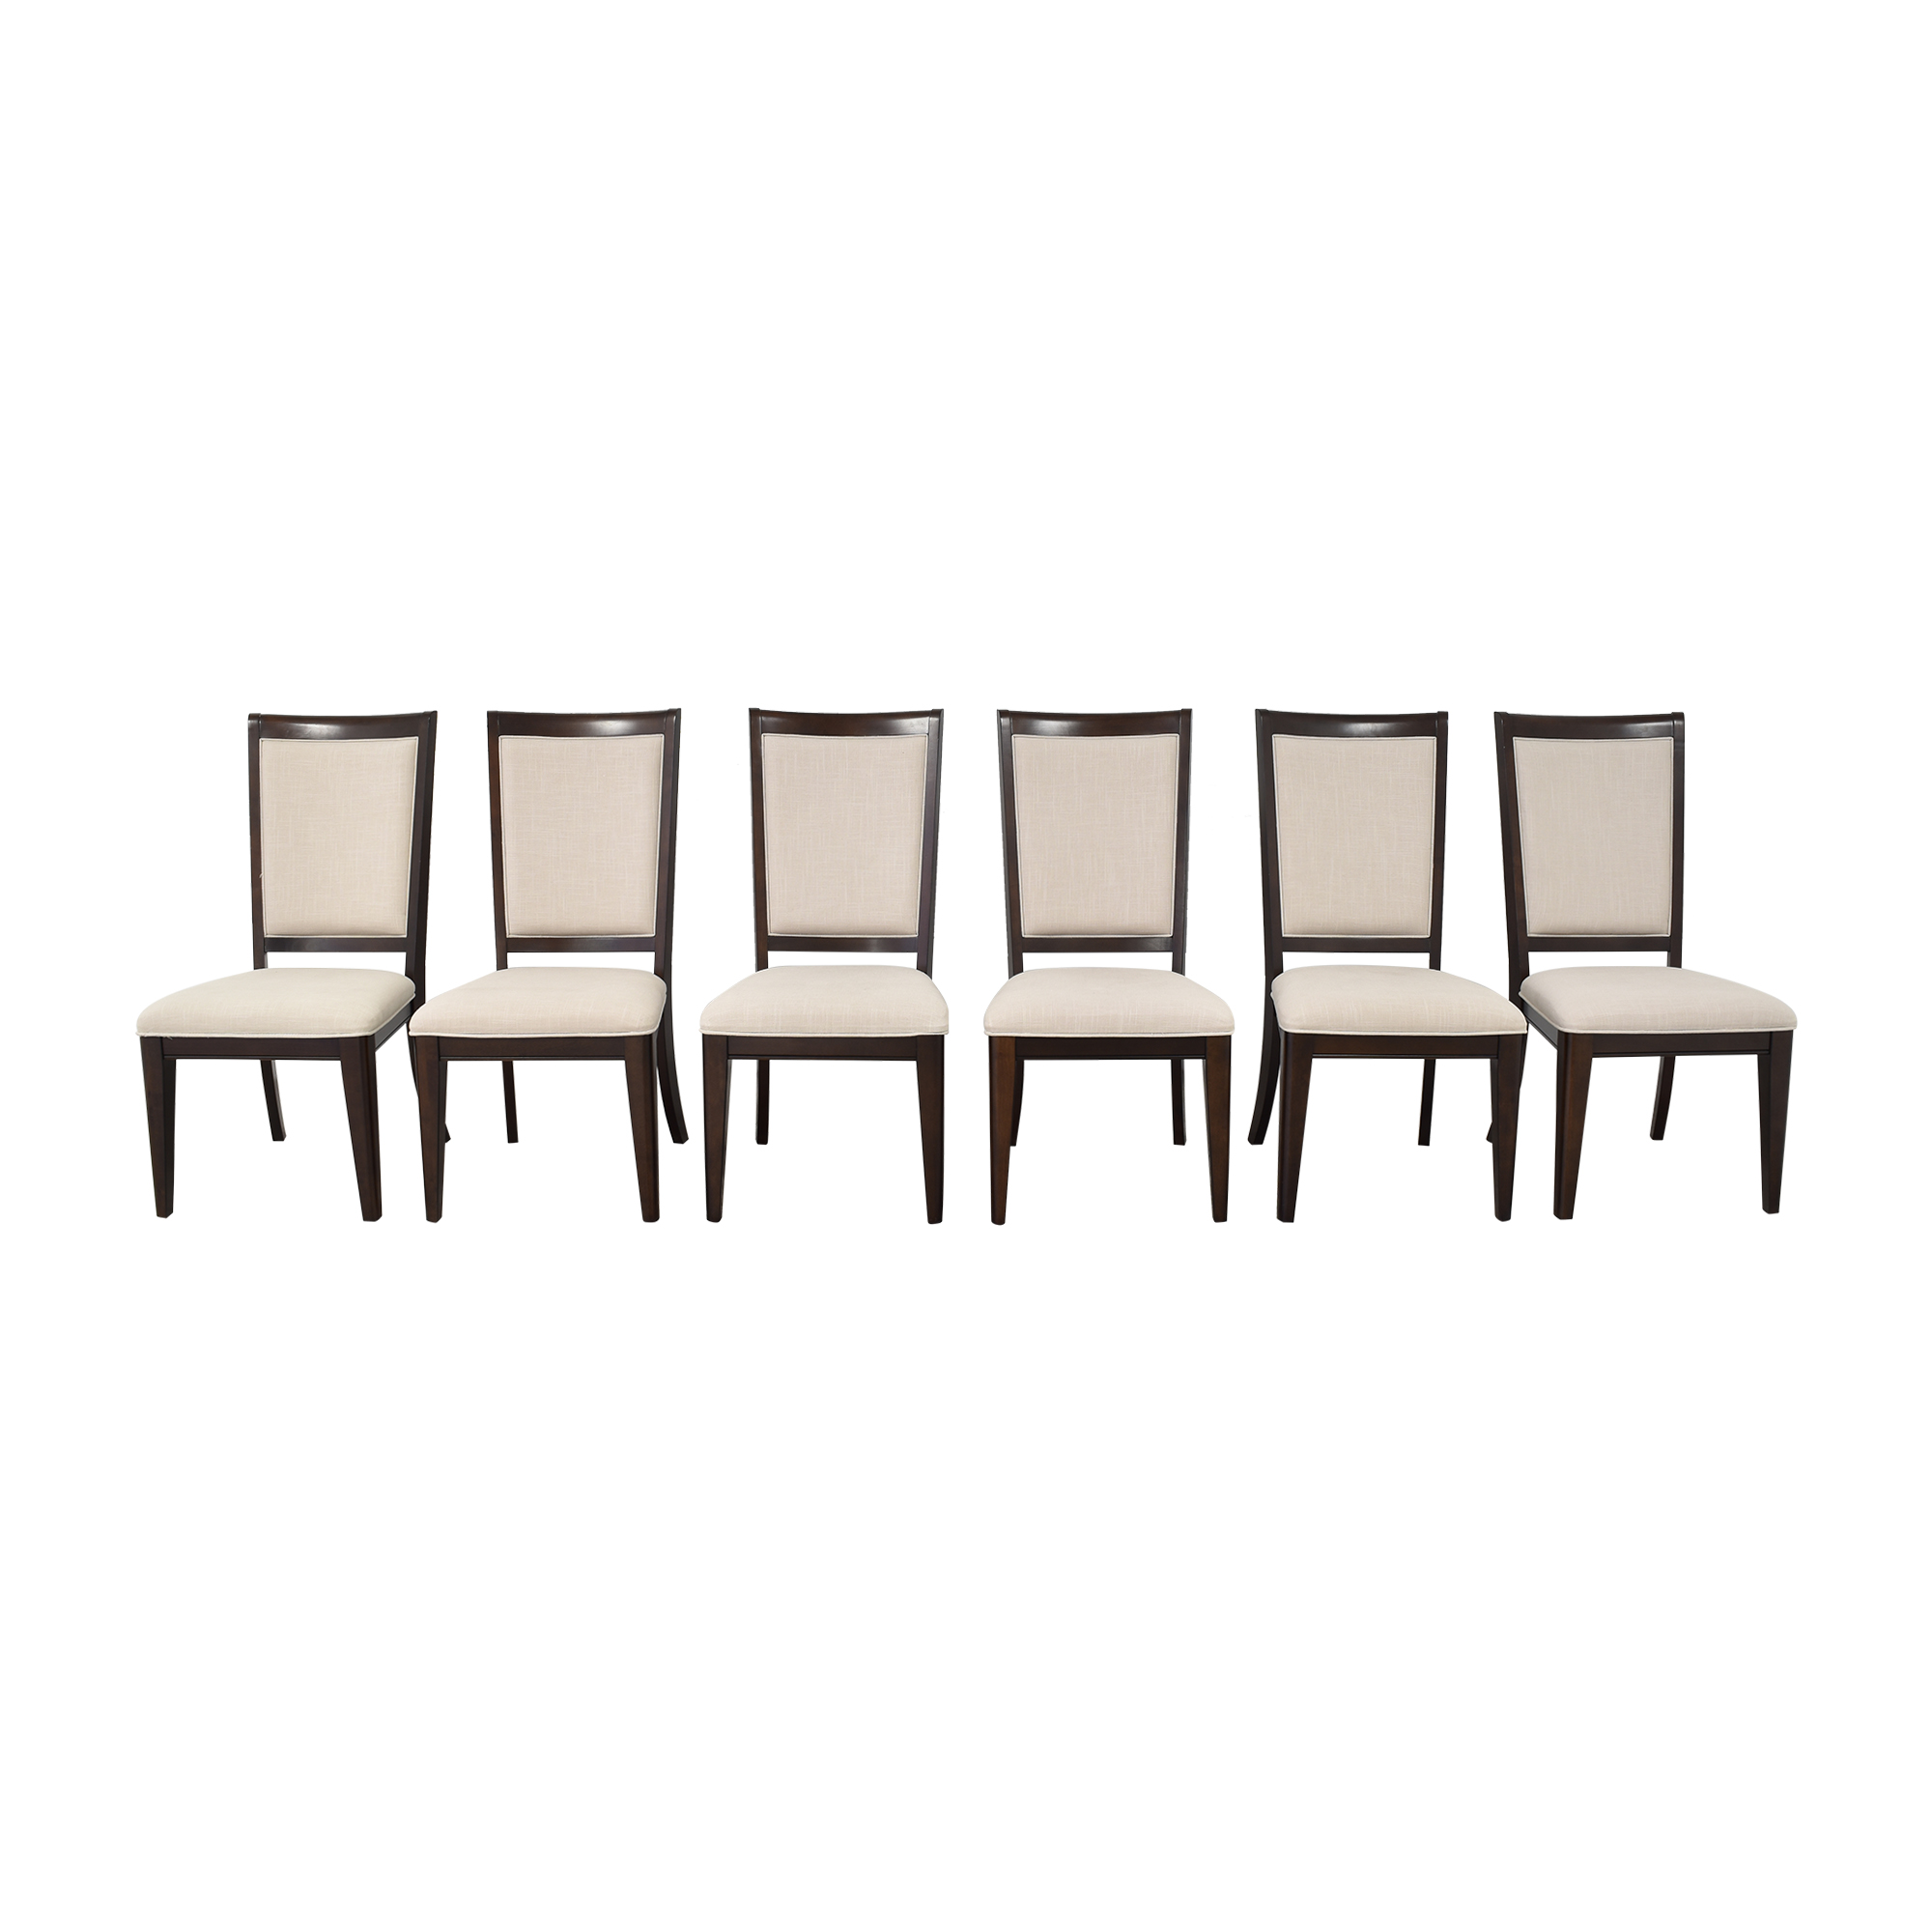 buy Raymour & Flanigan Cadence Dining Side Chairs Raymour & Flanigan